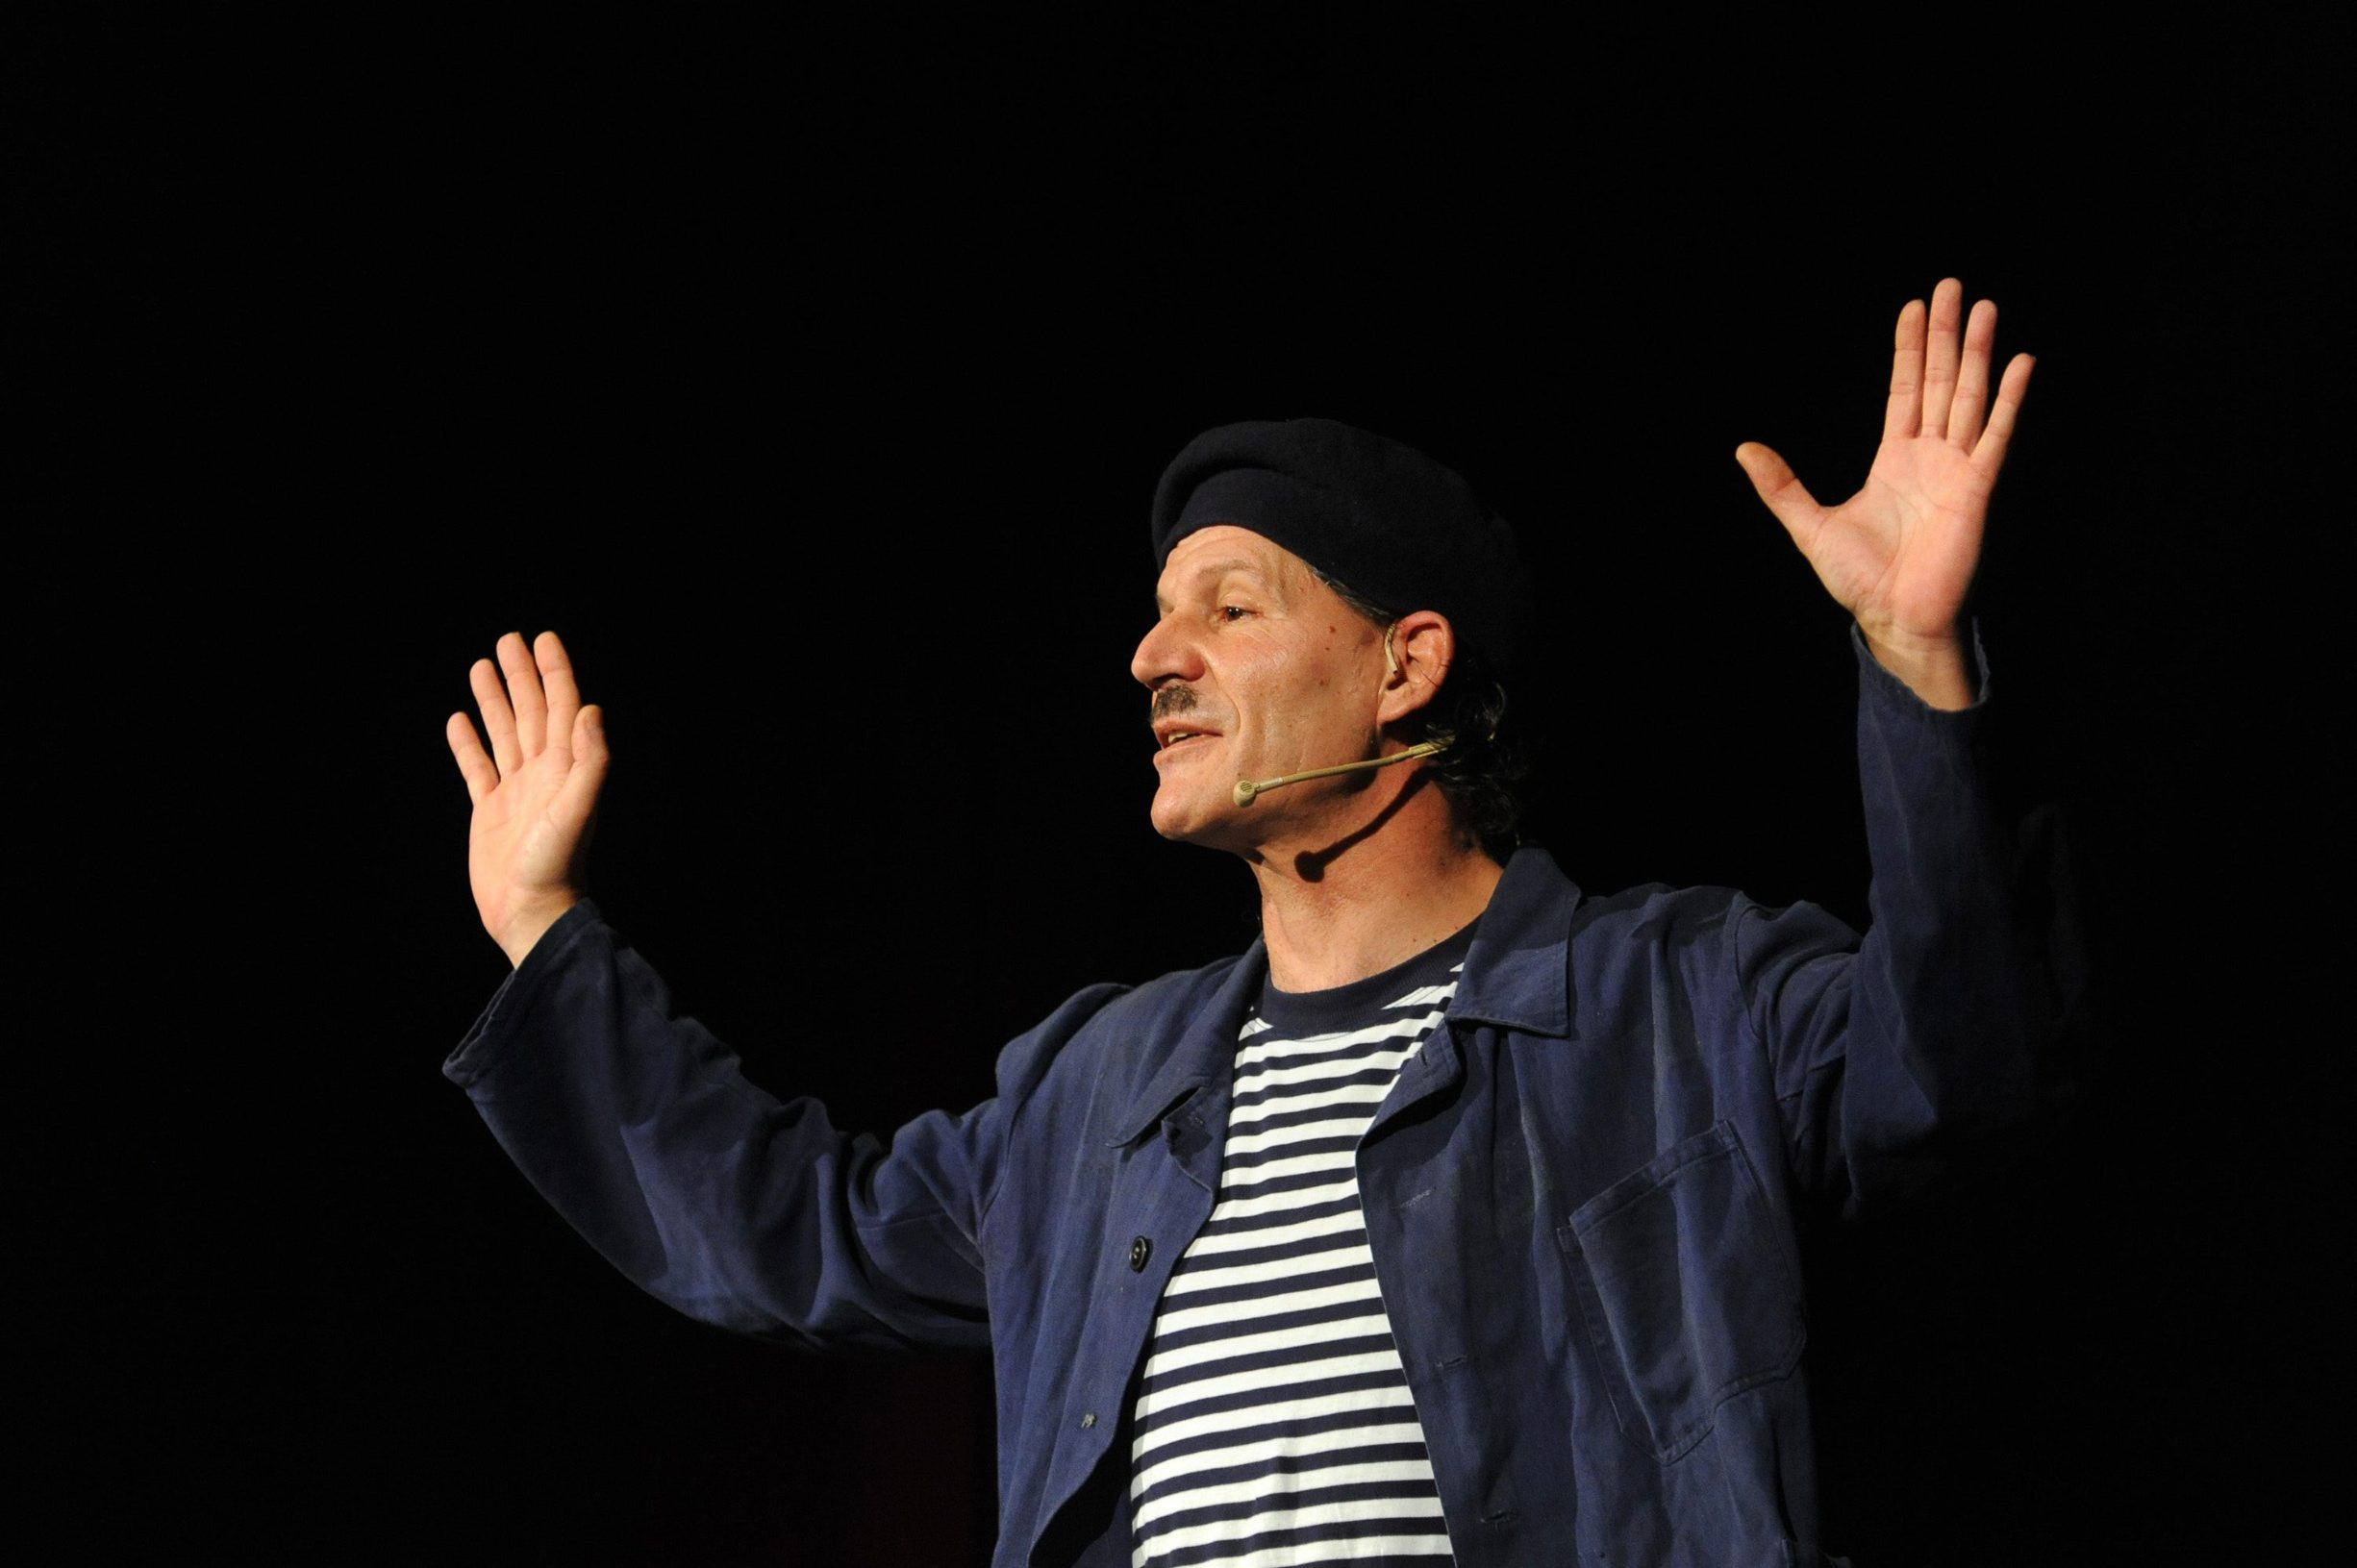 Zadar, 271212. Veceras je u HNK Zadar gostovao Damir Mihanovic Cubi sa svojom monokomedijom